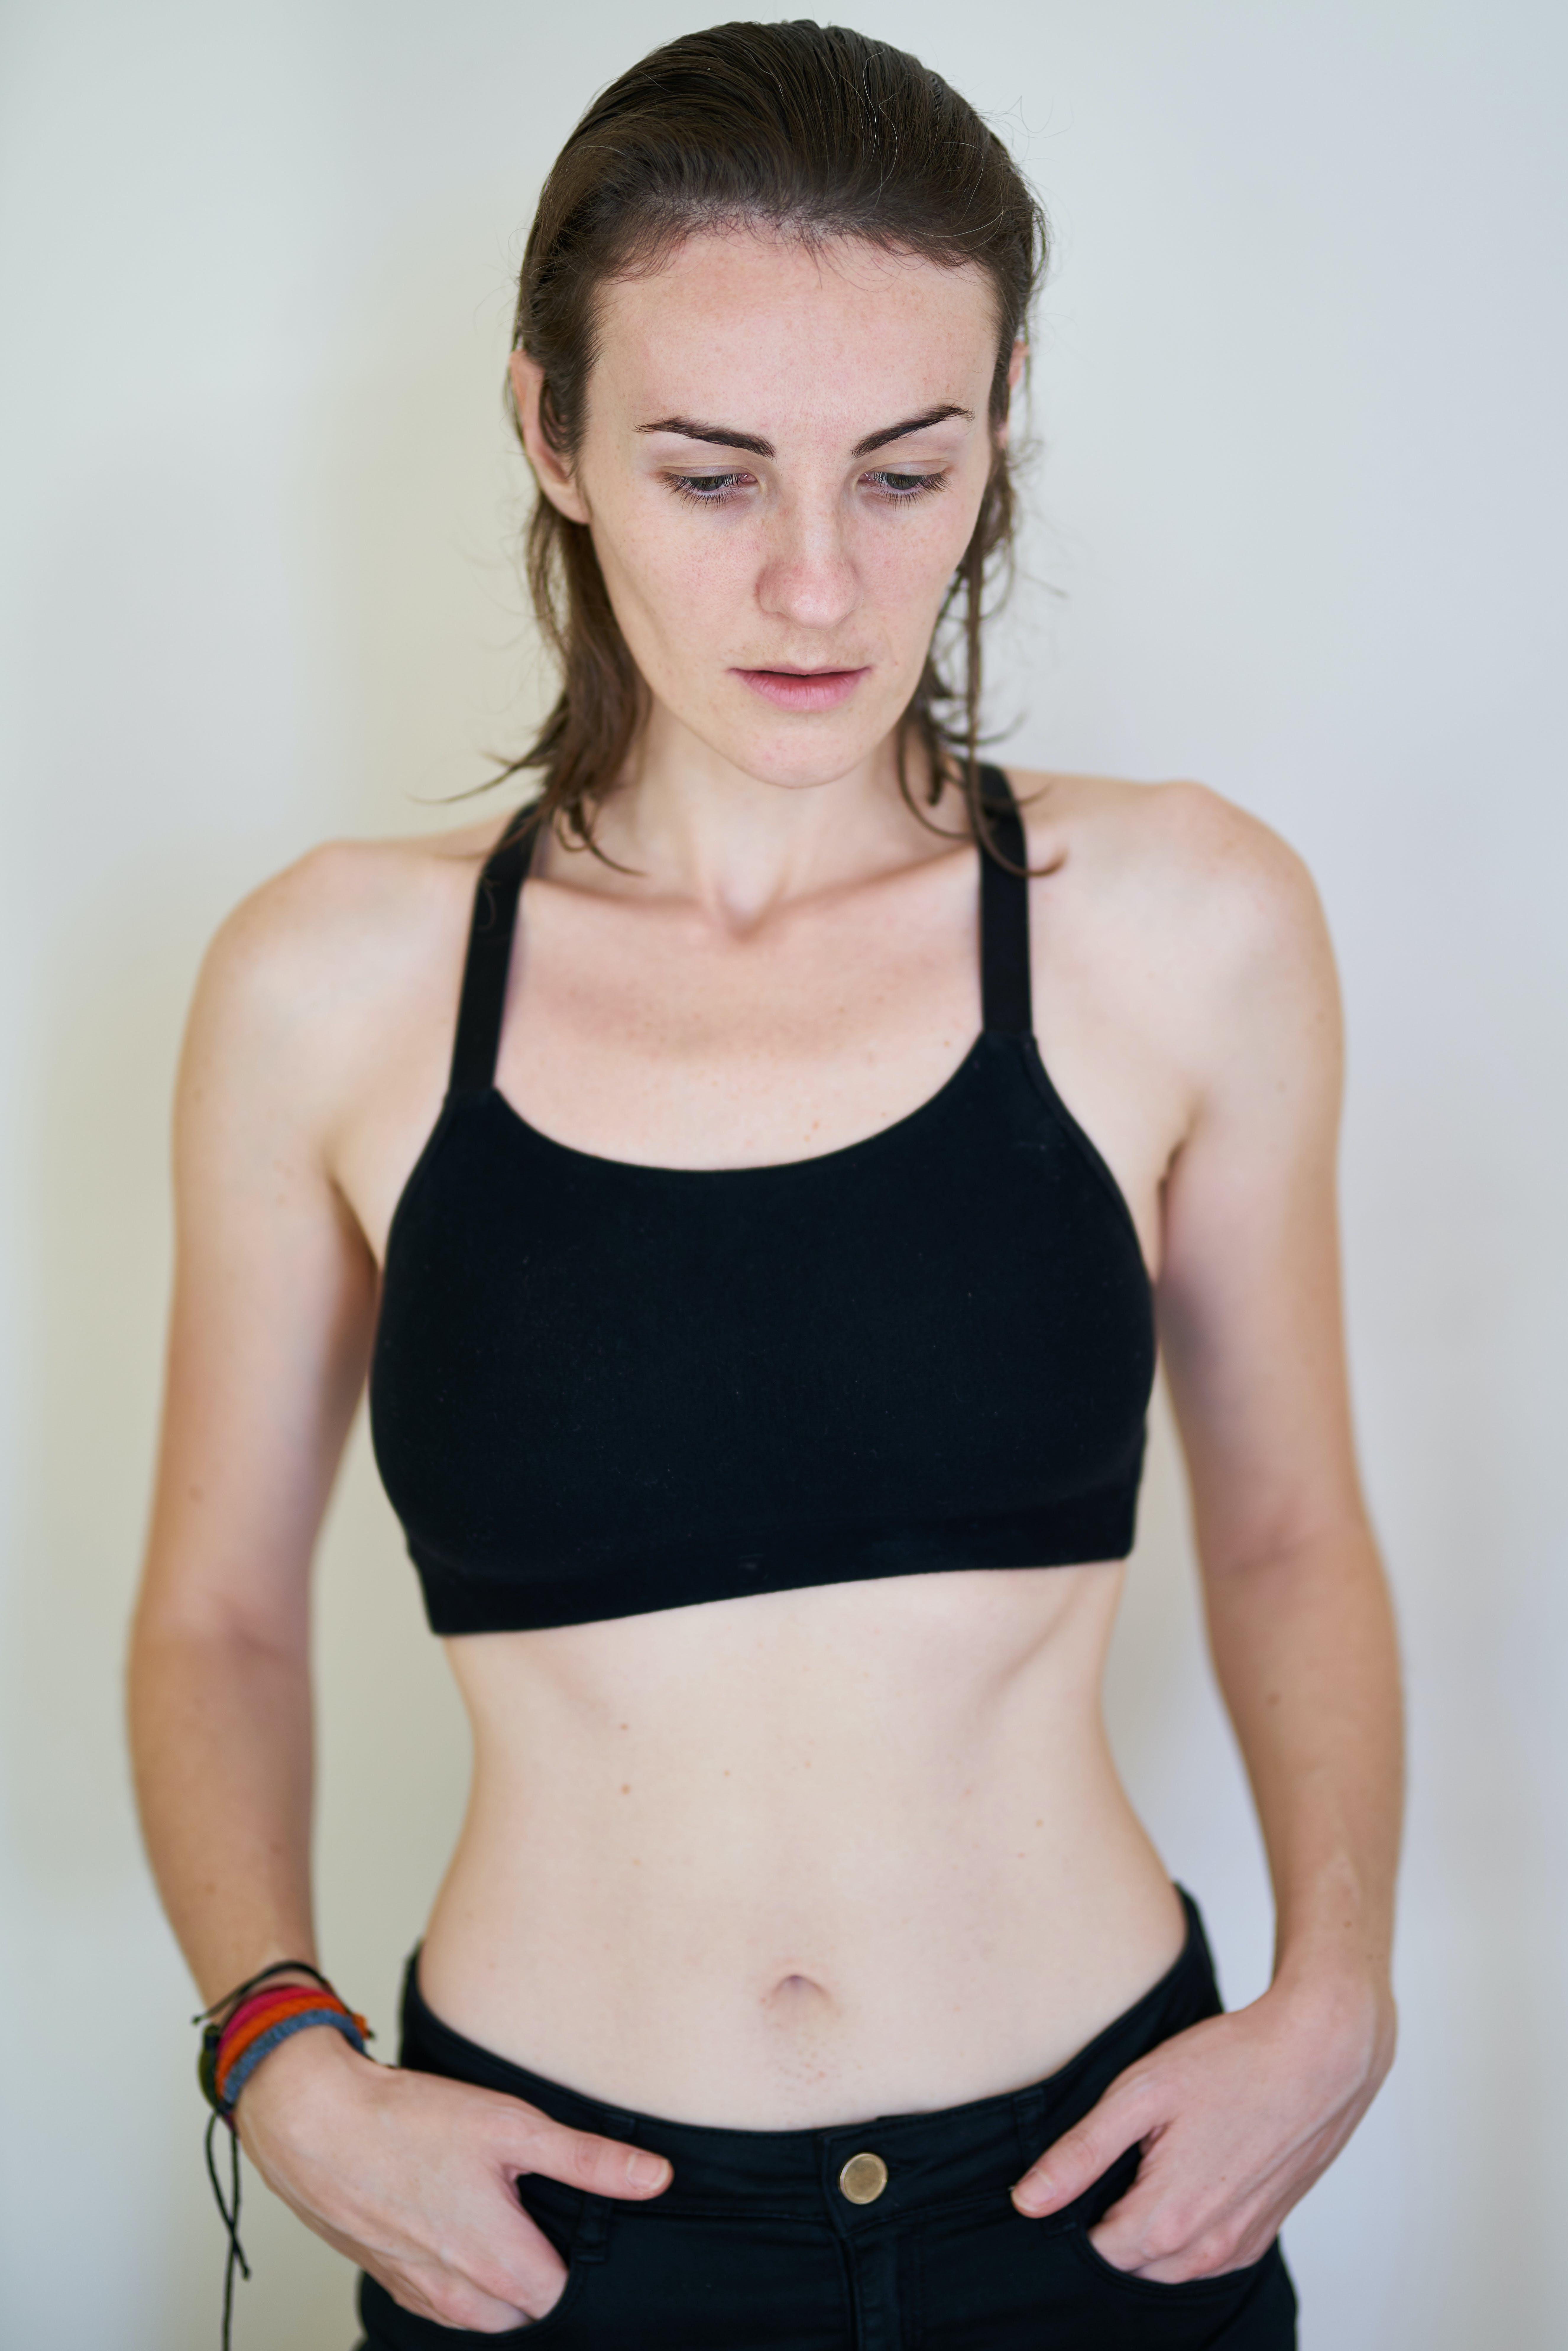 Photo of Woman in Black Crop Top